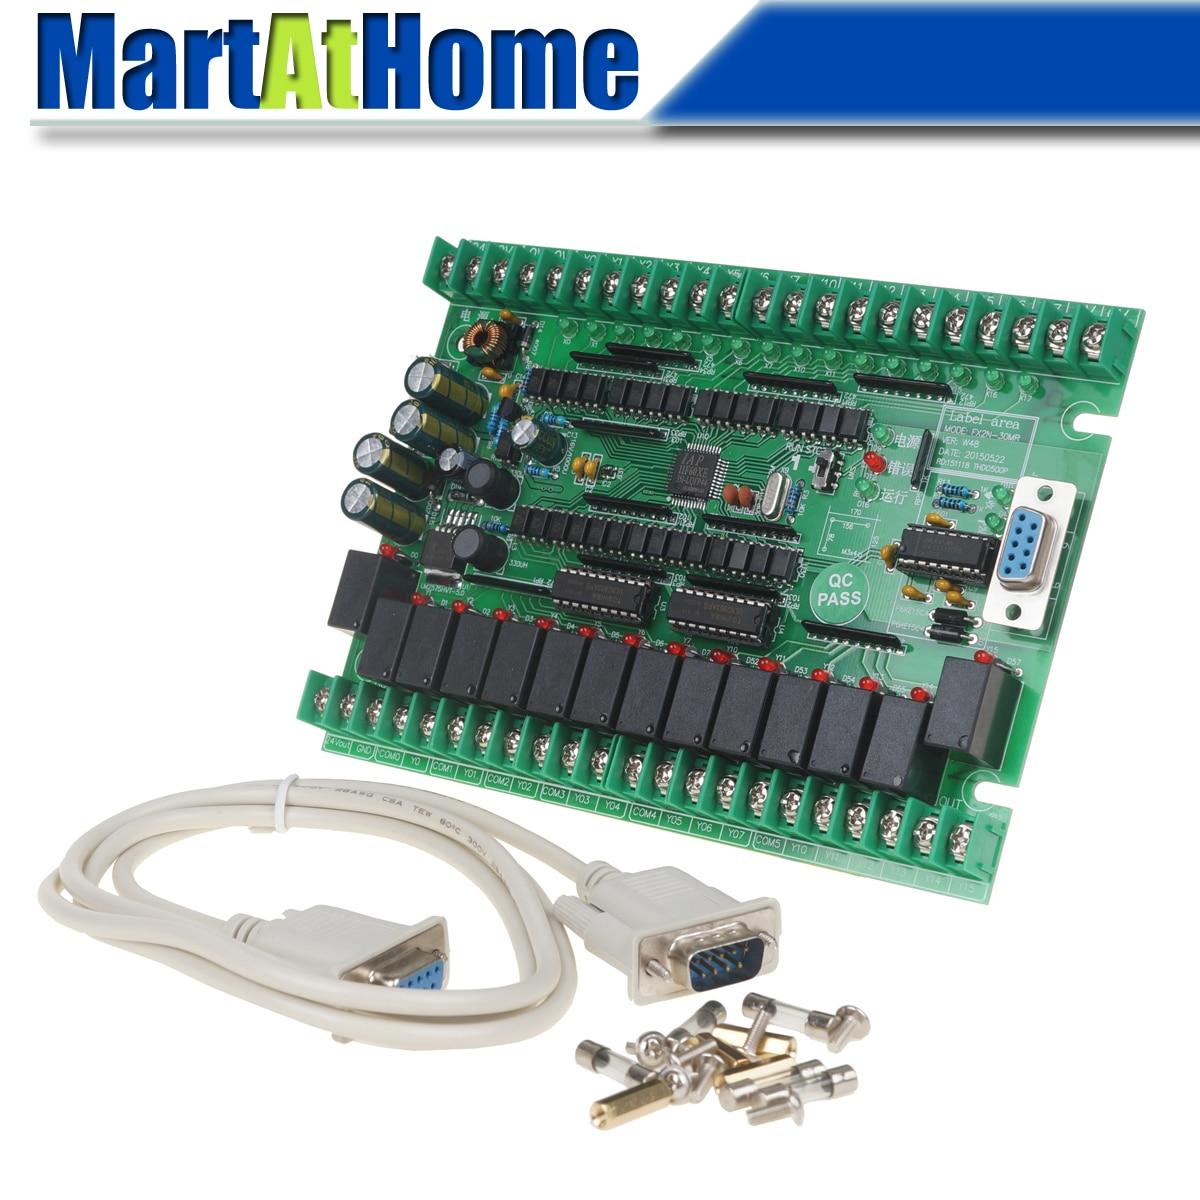 FX2N 30MR 51 PLC Programmable Logic Controller PLC Microcontroller Control Board Control Panel GX7 0 GX8